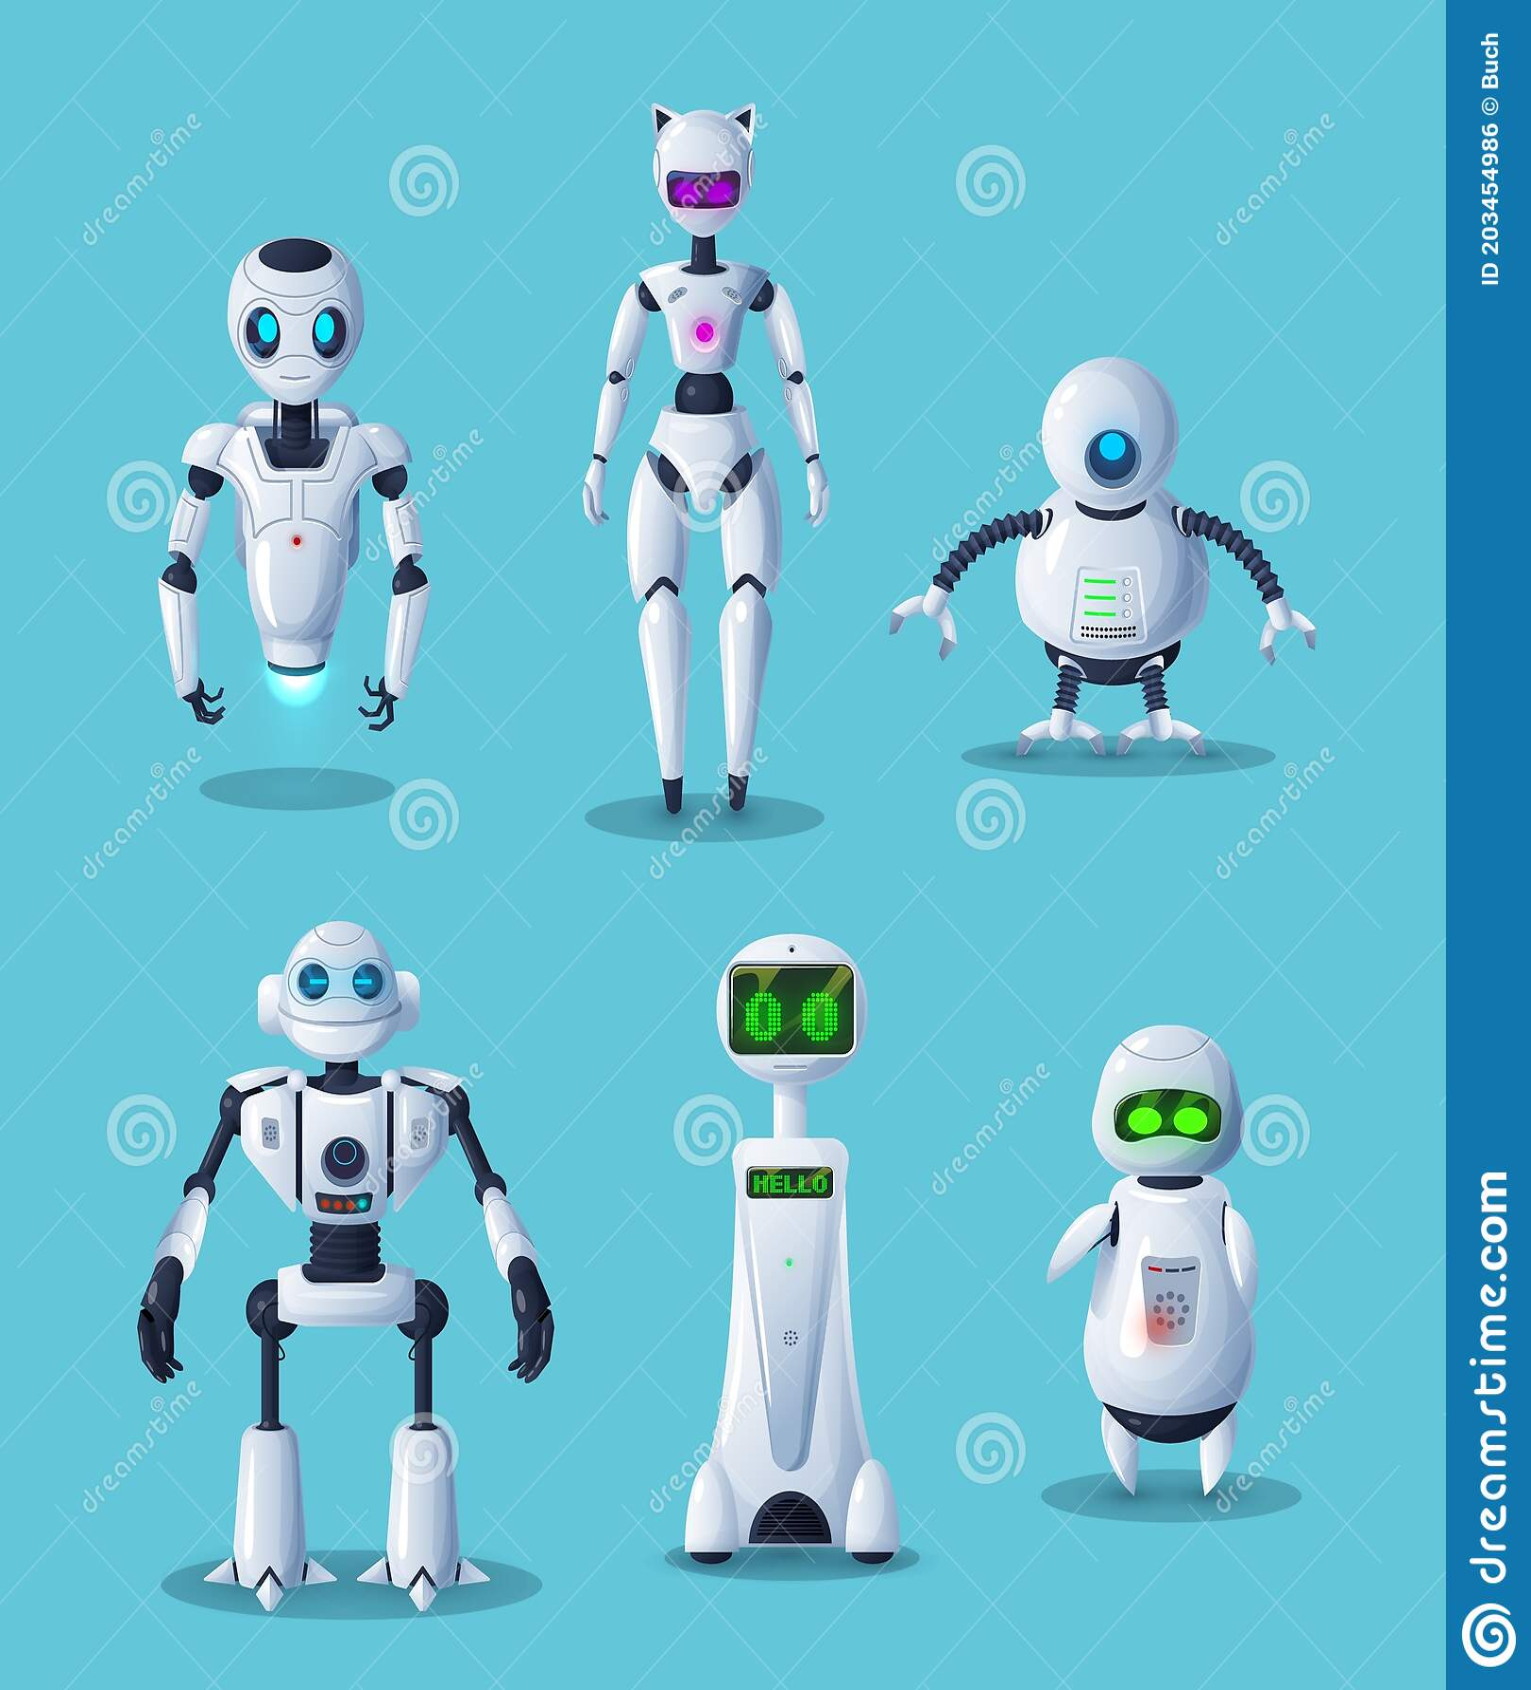 Modern Robot Cartoon Characters, Ai Technology Stock Vector ...